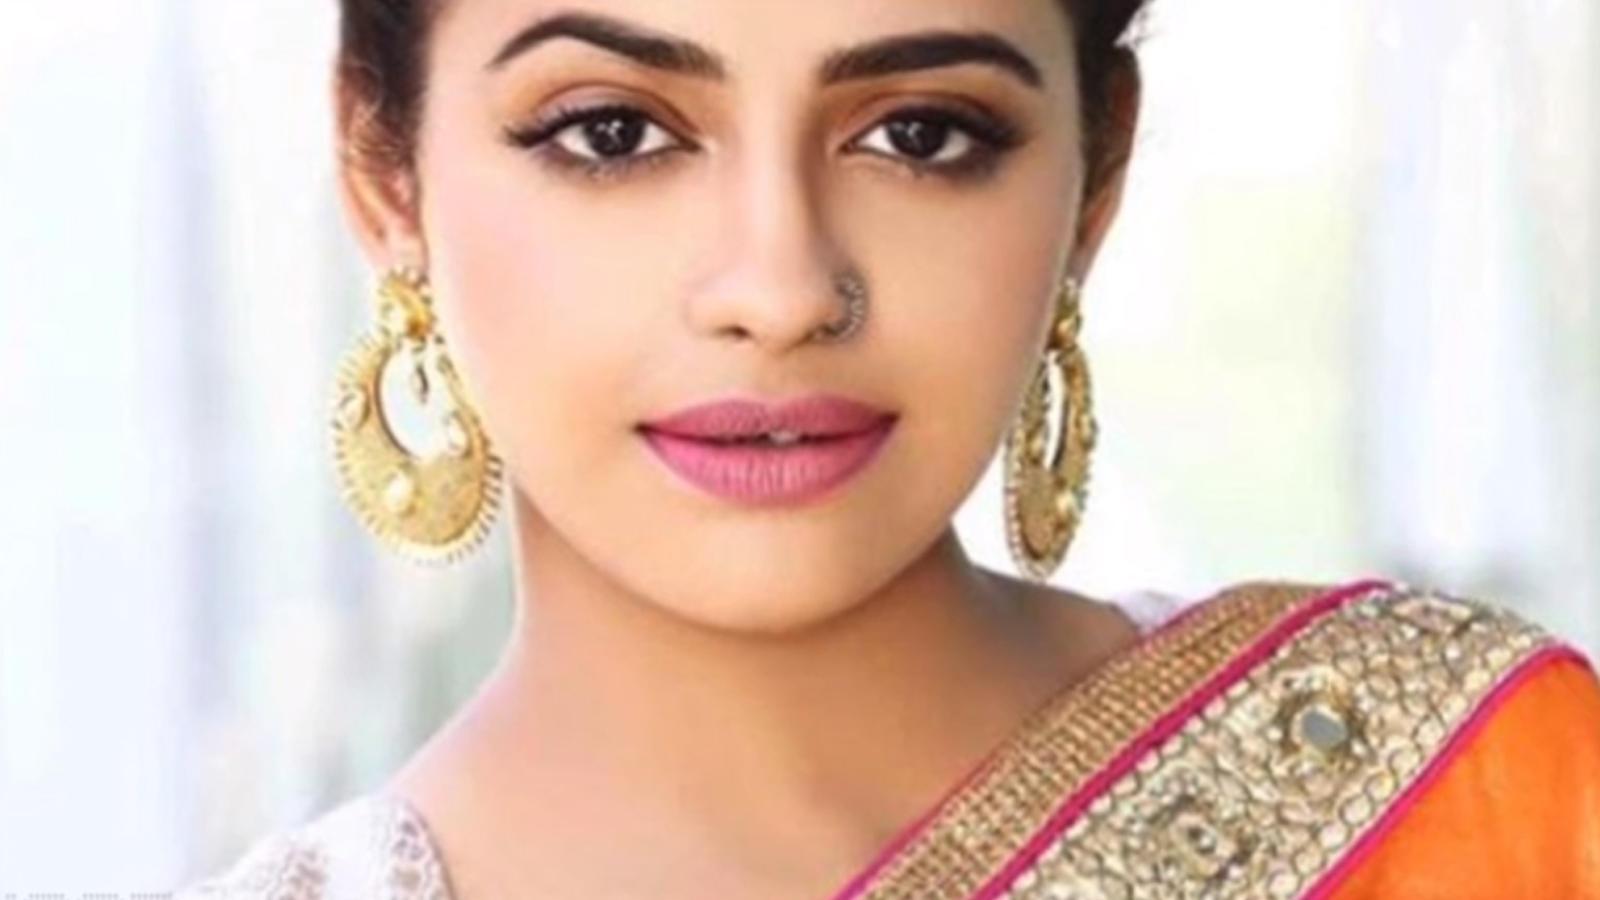 Ravi Kishan's daughter Riva Kishan's glamorous pictures